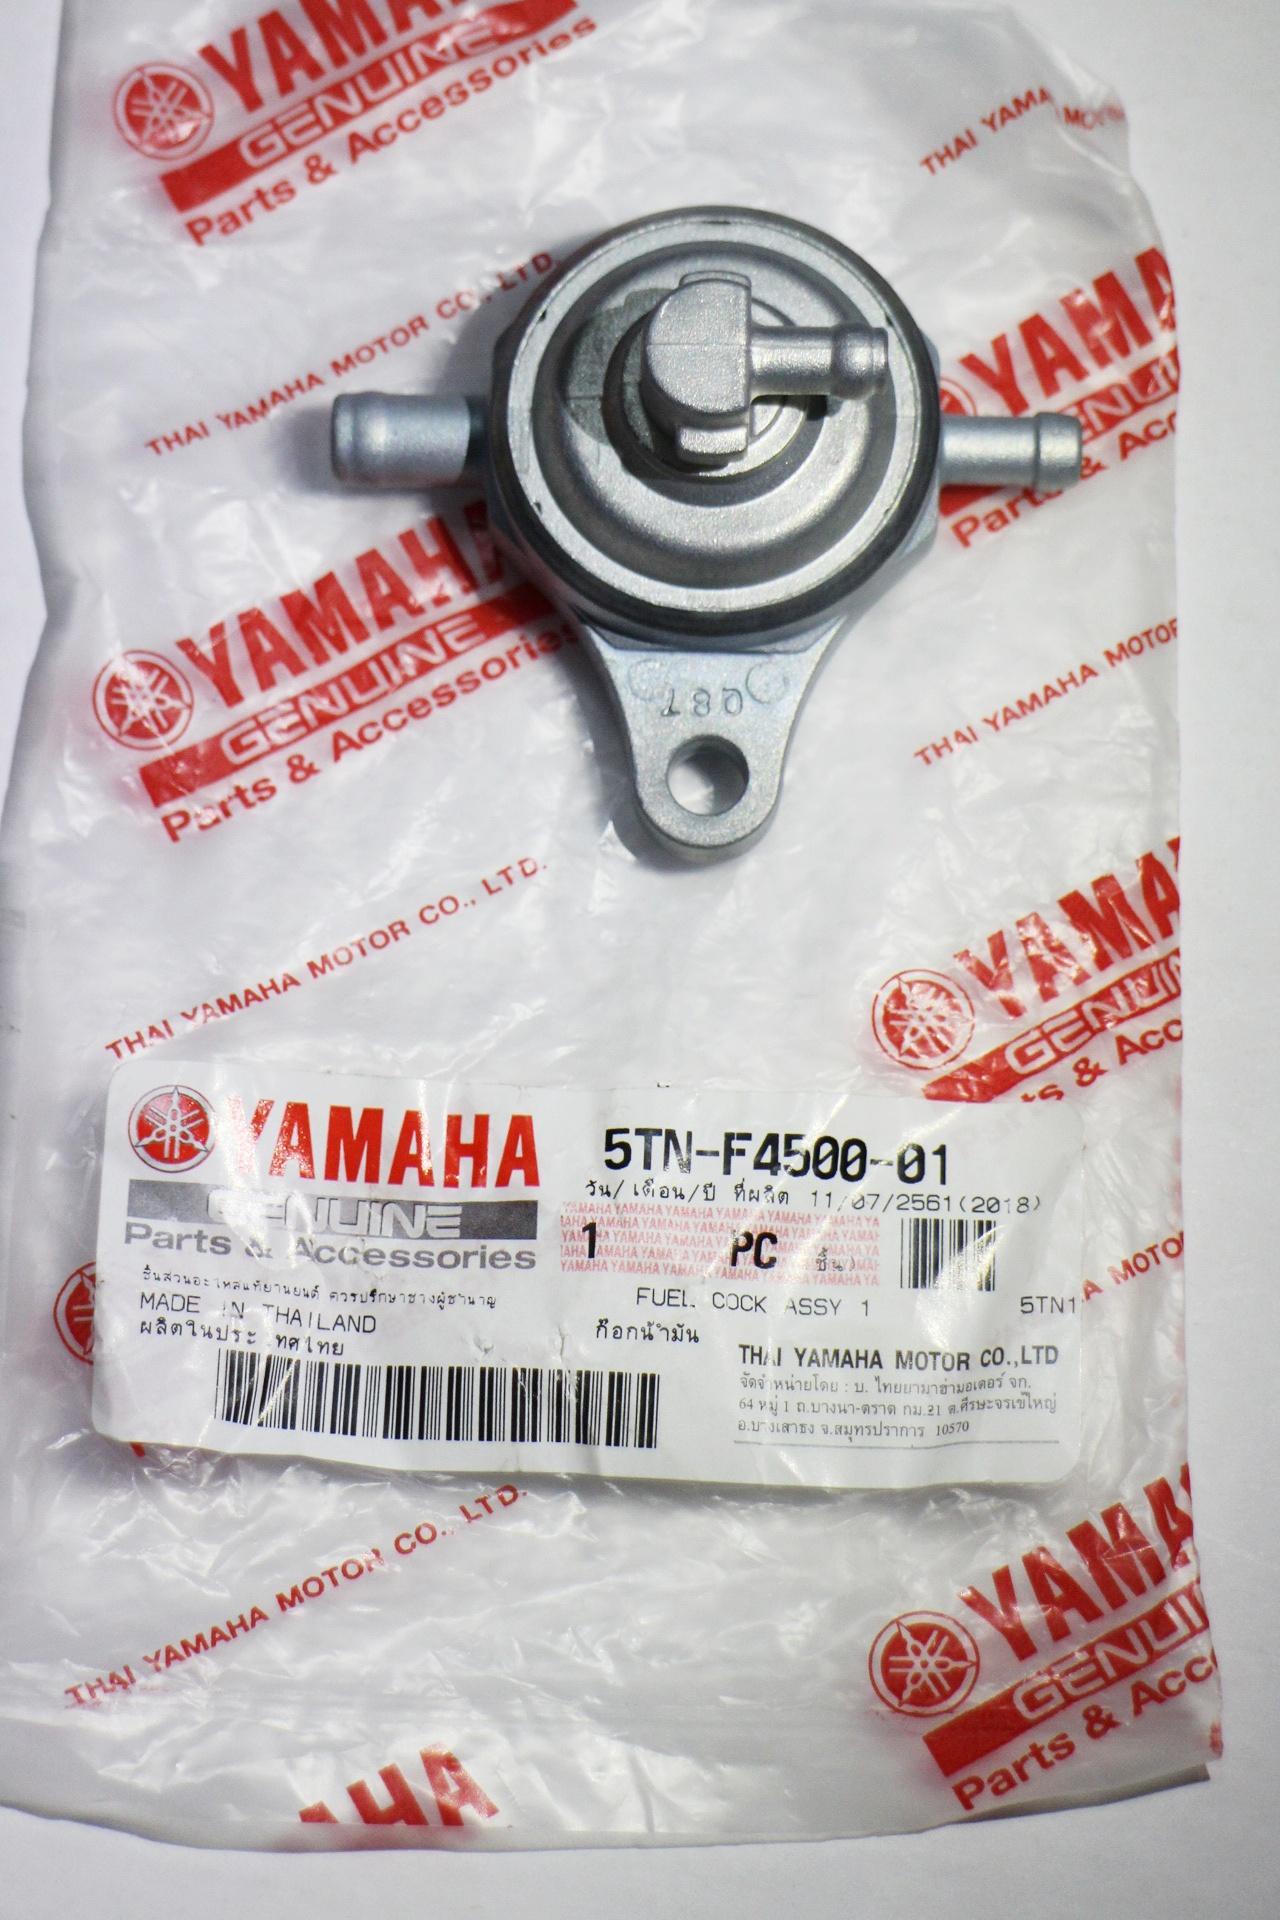 Original Yamaha Fuel Cock Assy For Vega Force By Jca Motorshop.